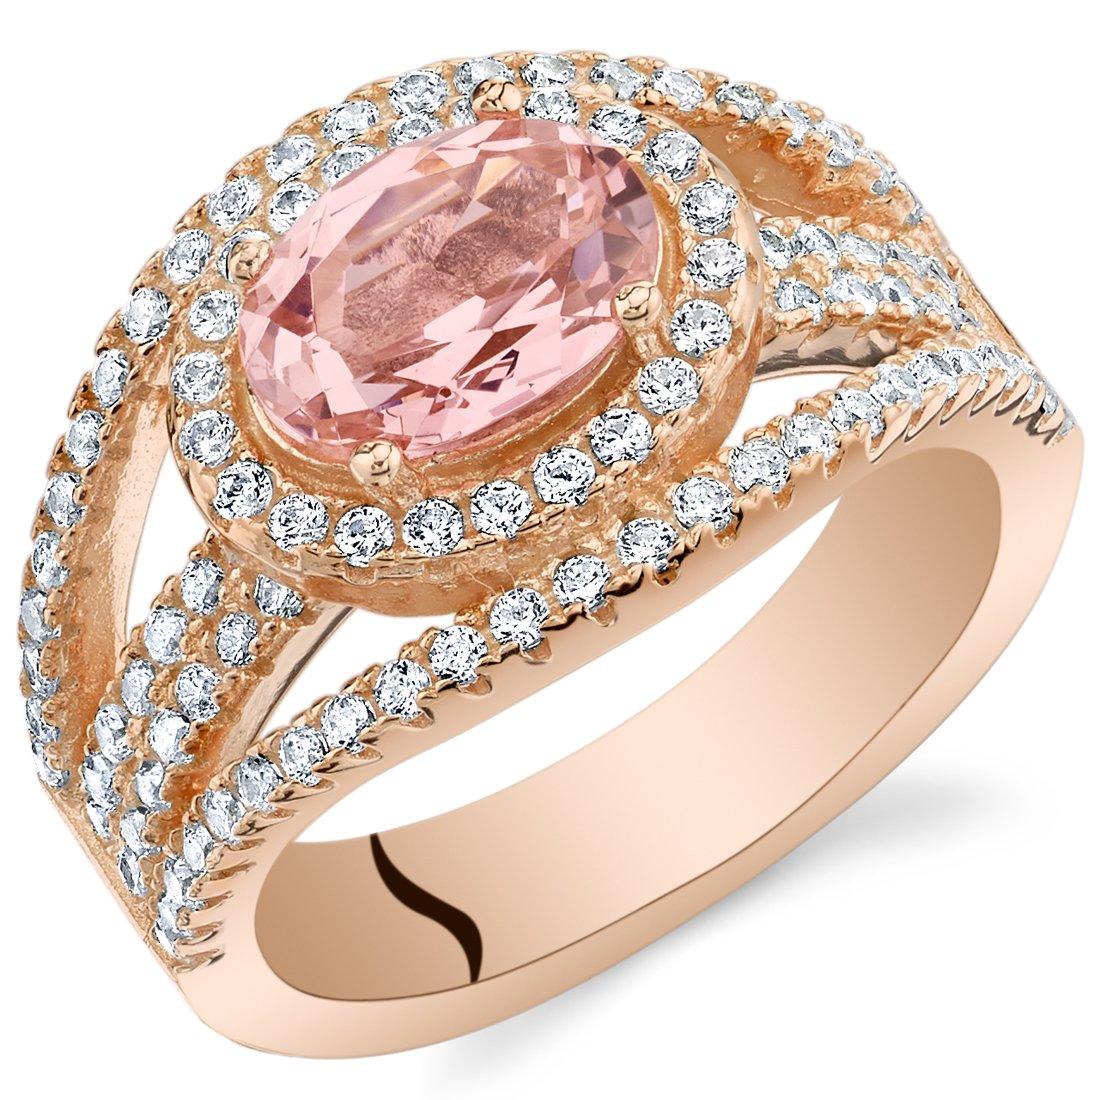 Peora Simulated Morganite Rose-Tone Sterling Silver Serenity Ring